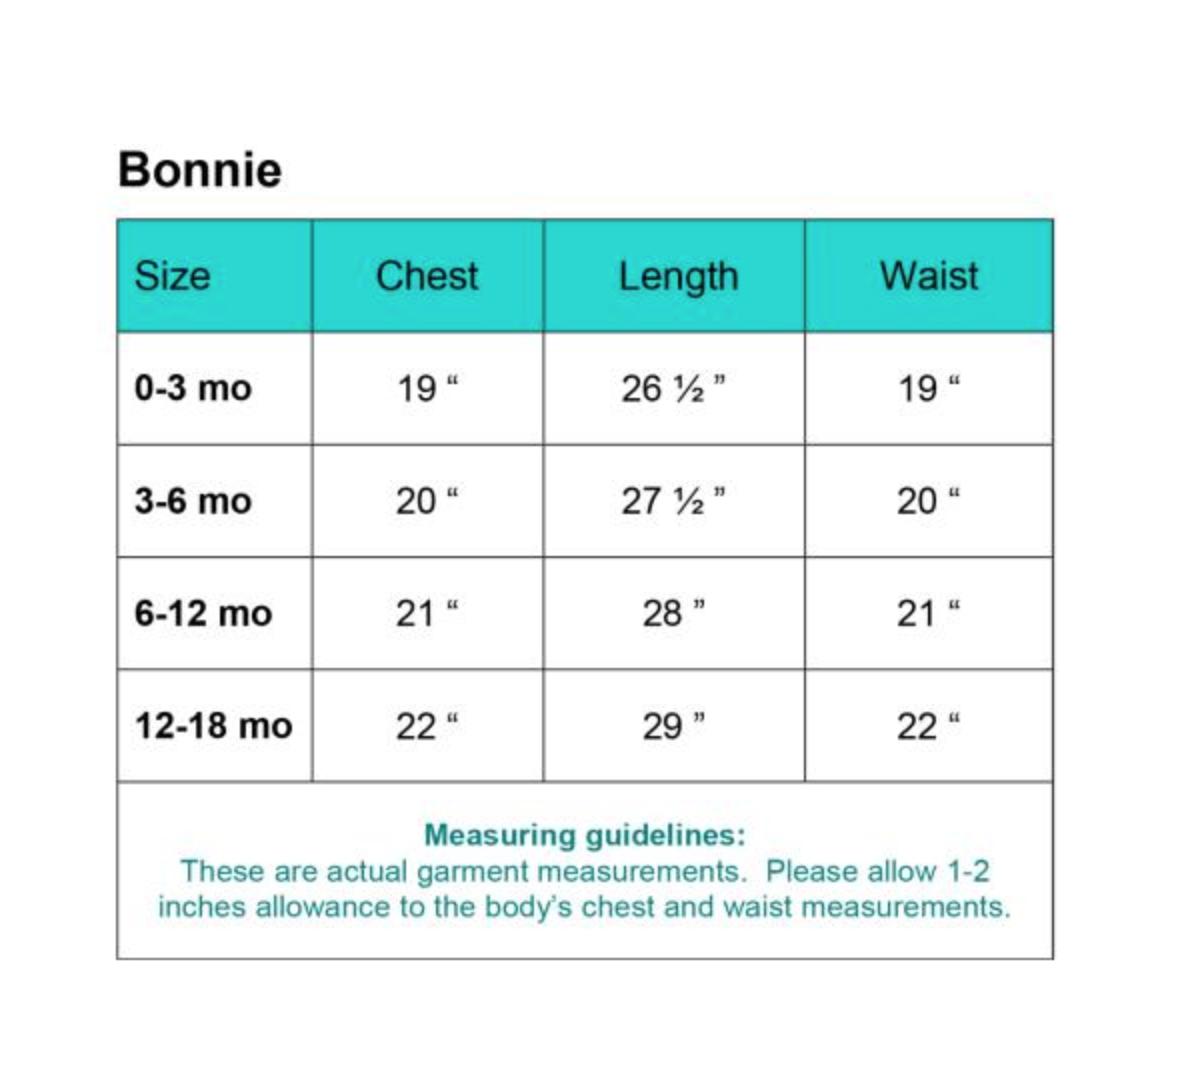 sizing-chart-bonnie.png